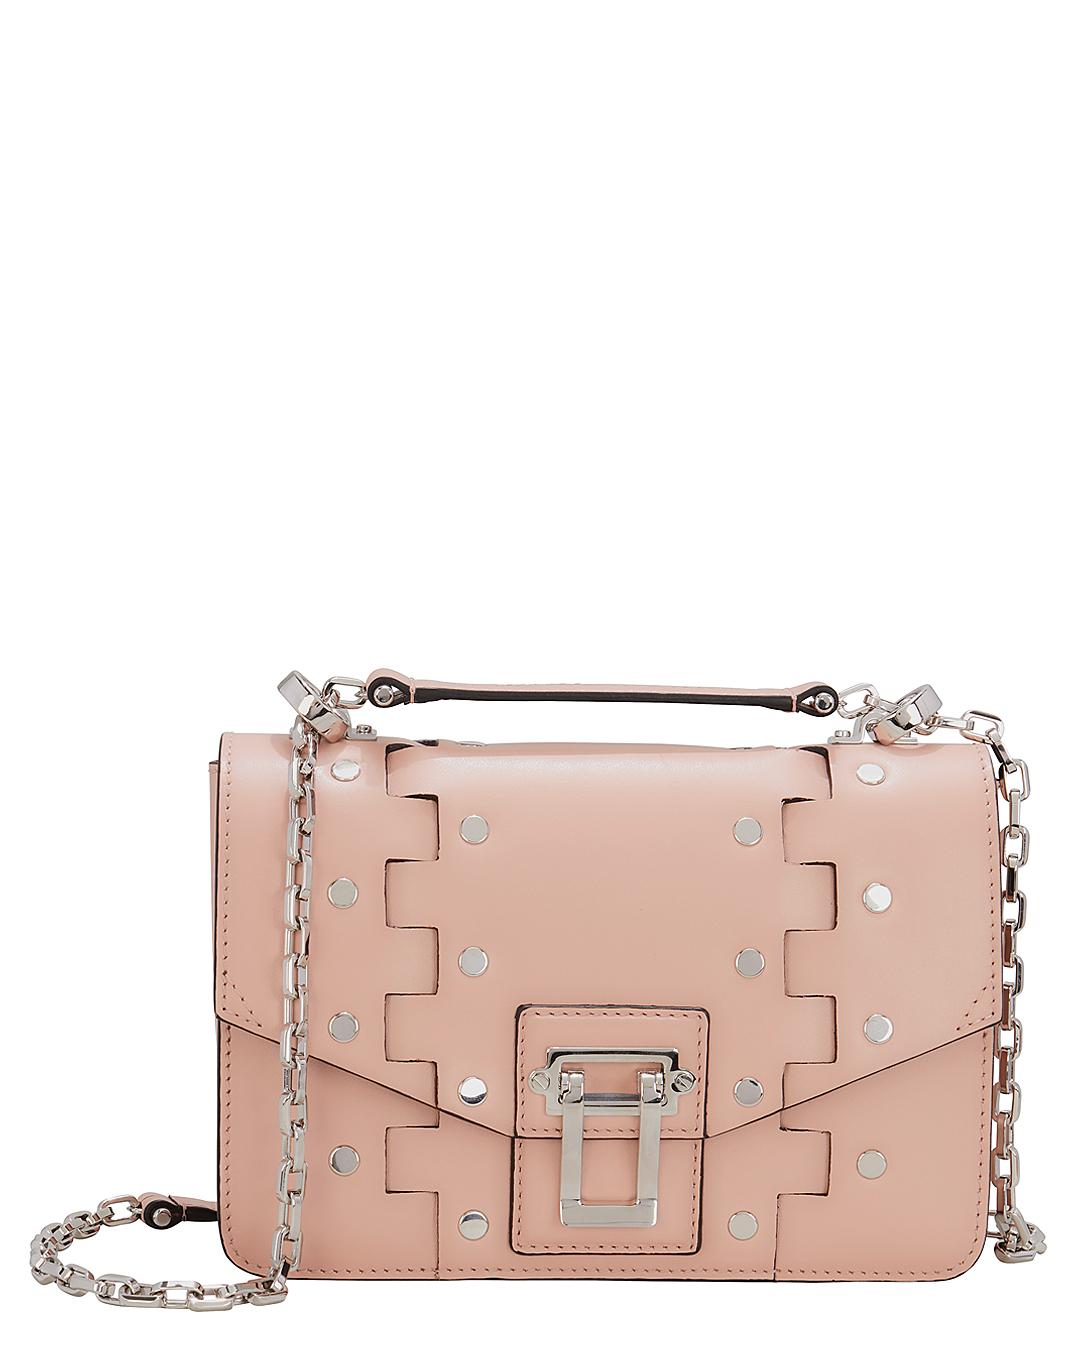 Hava Chain Blush Bag